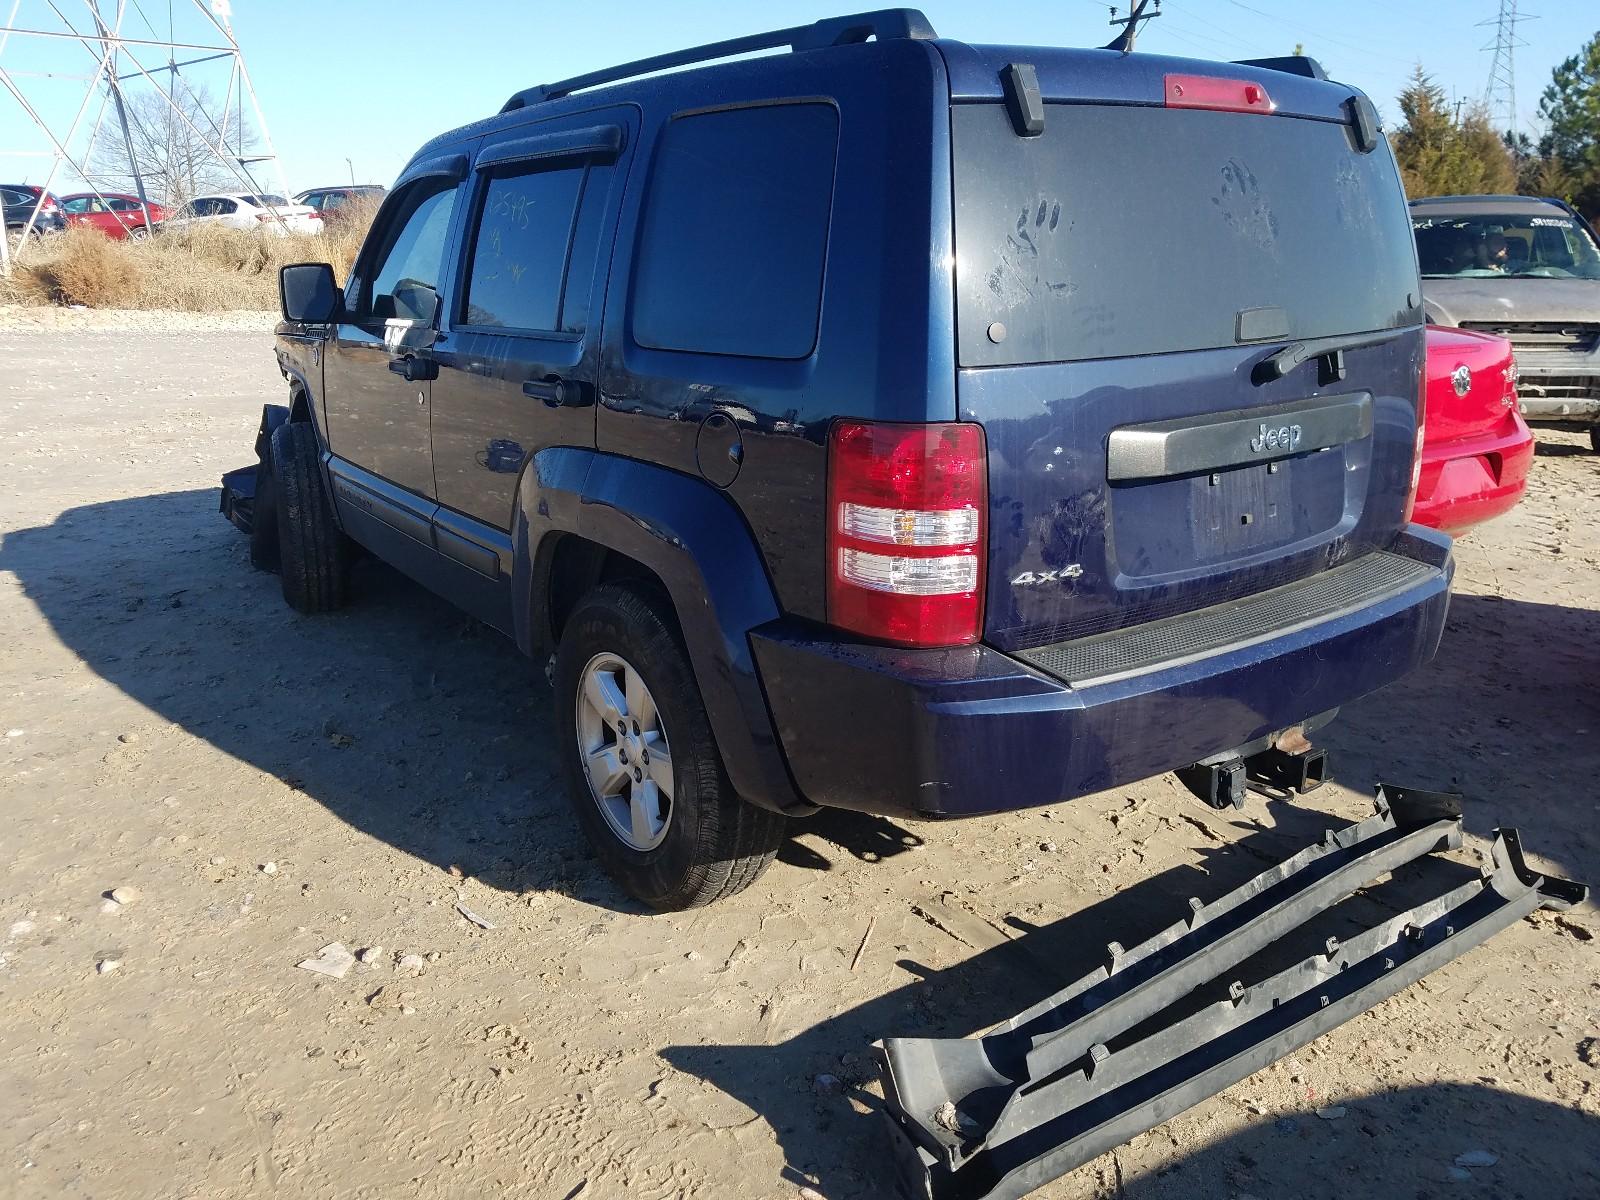 1C4PJMAK1CW154267 - 2012 Jeep Liberty Sp 3.7L [Angle] View